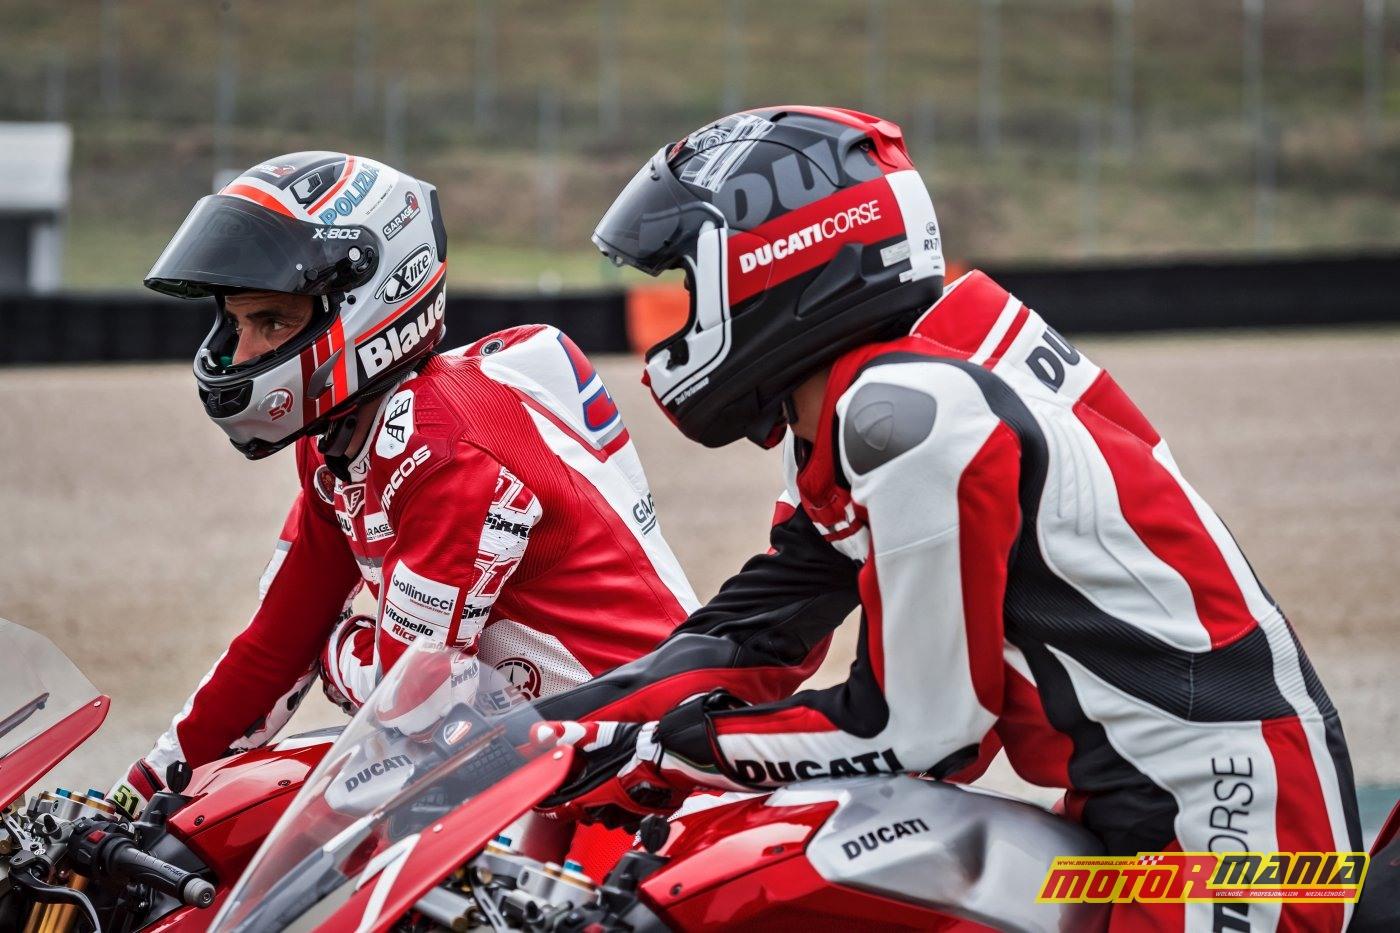 Ducati Panigale V4 R 2019 (55)